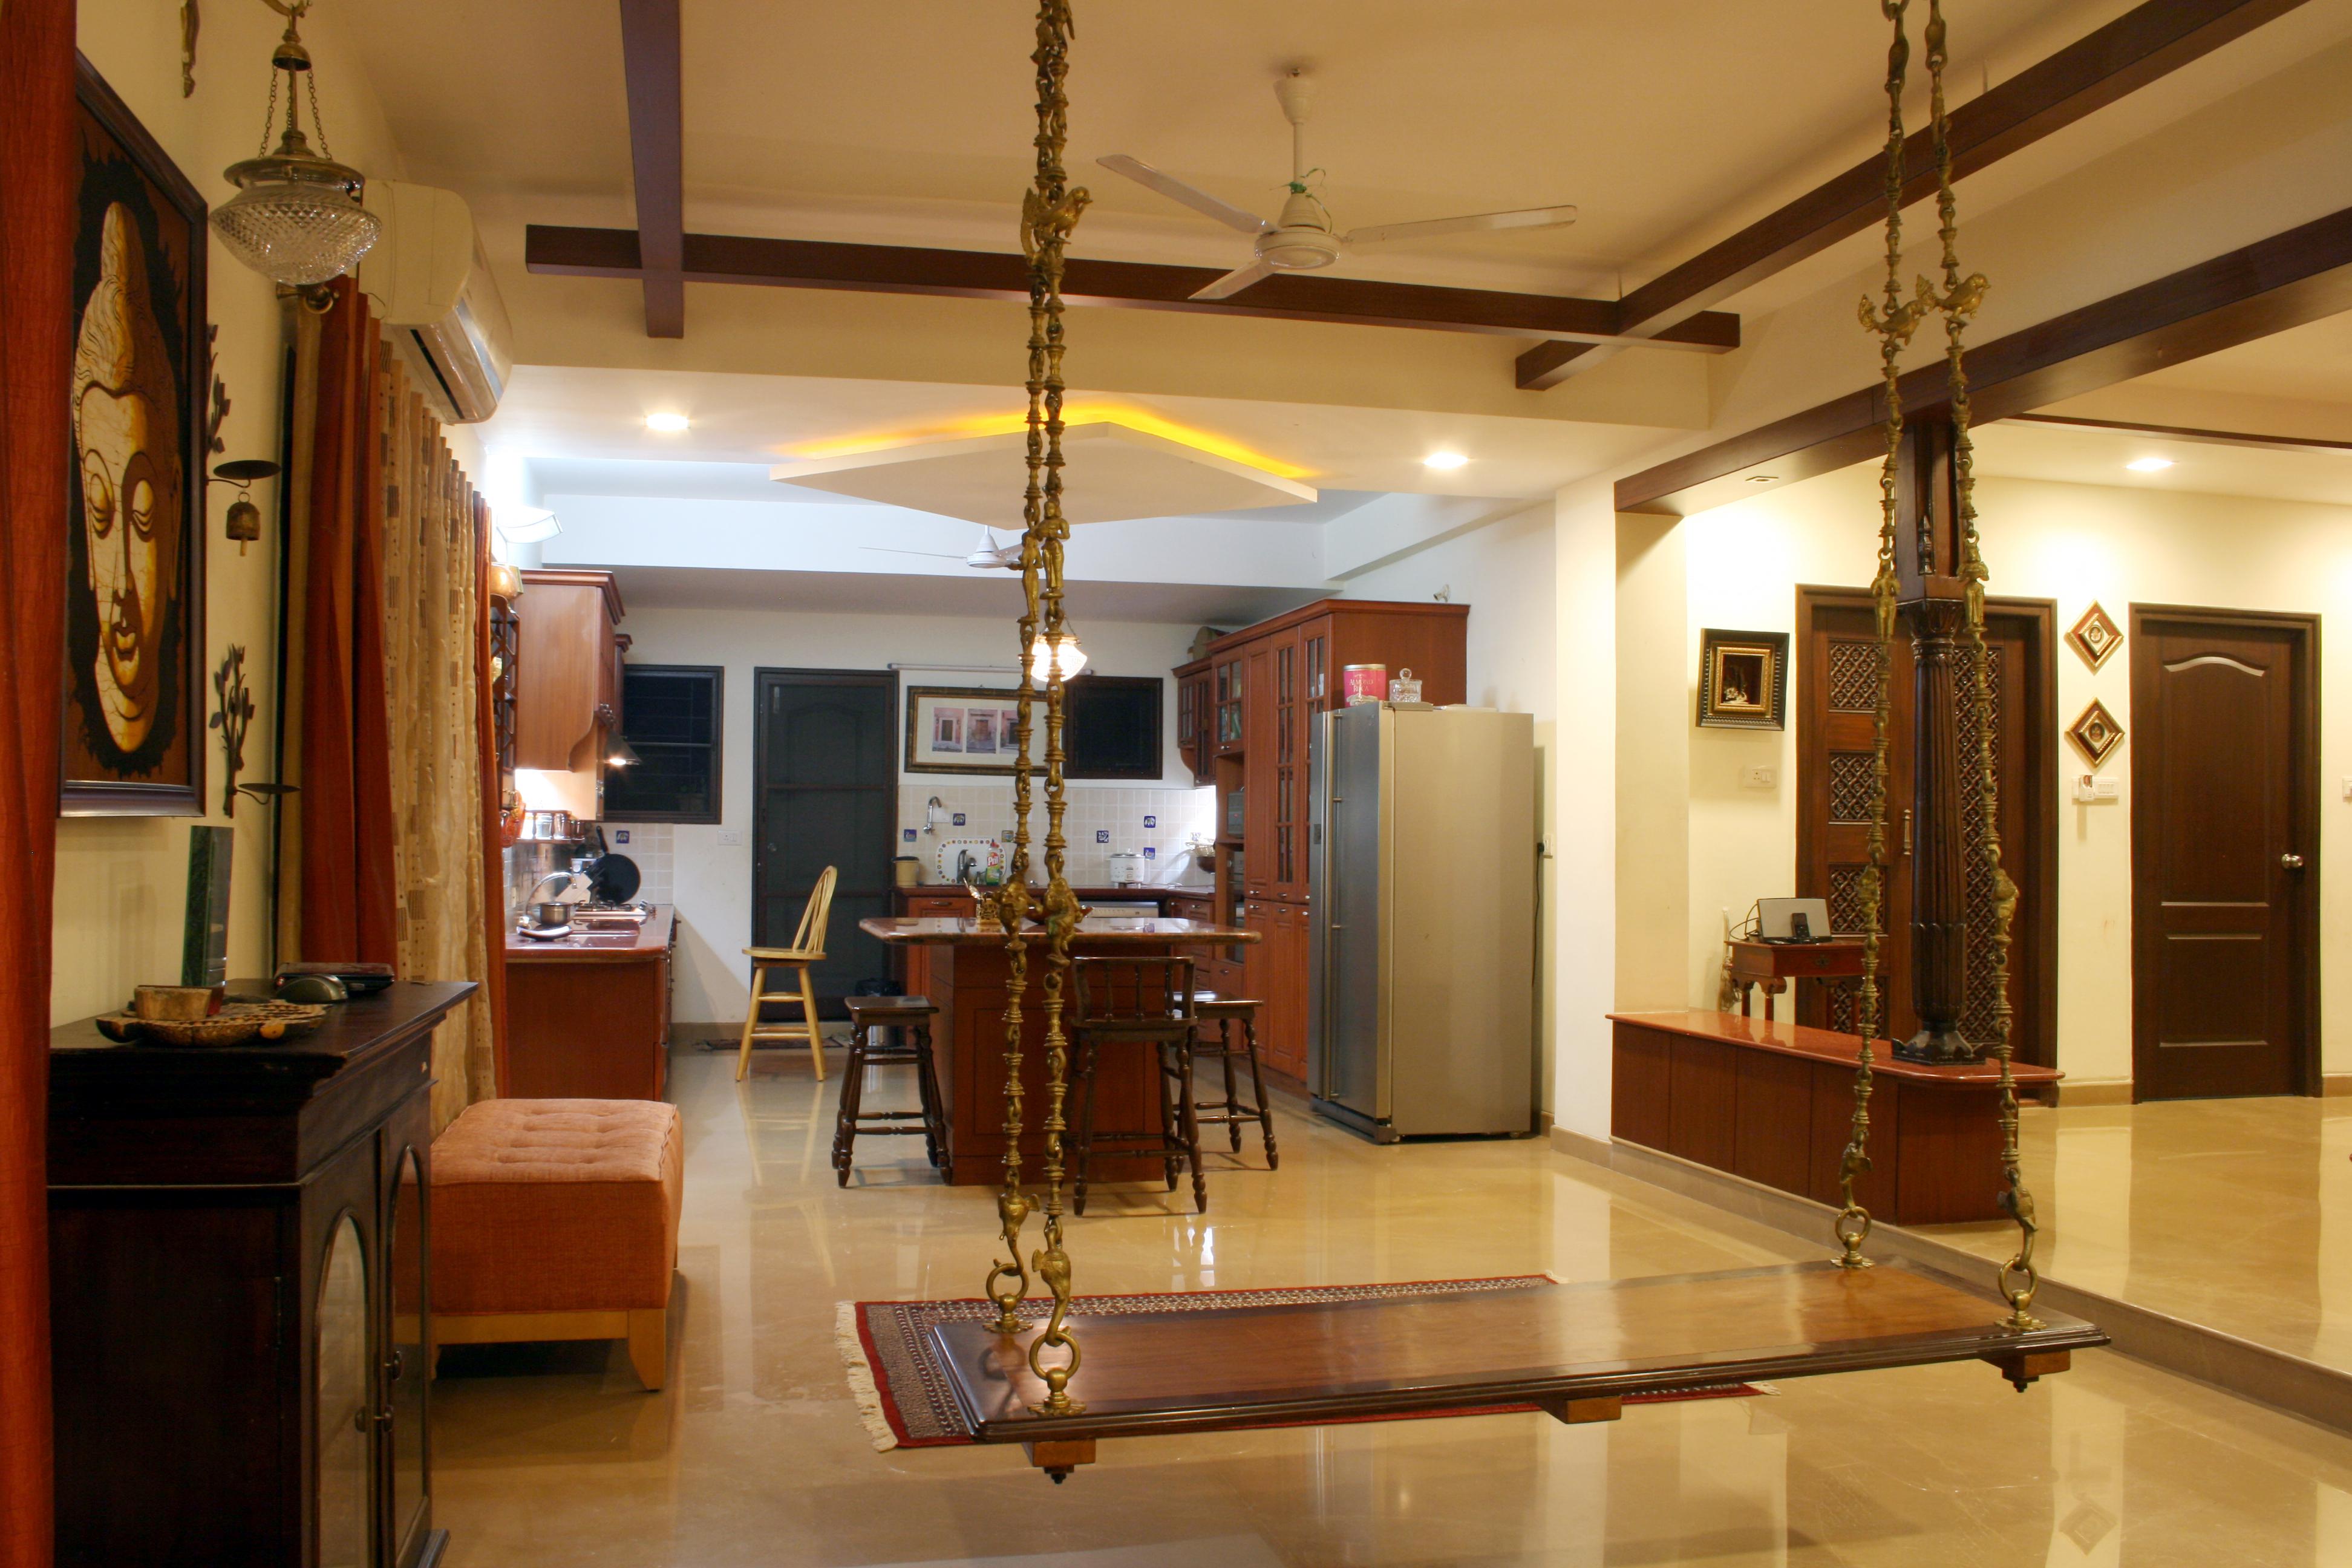 Residence of Mrs Vimala and Mr. Sriram